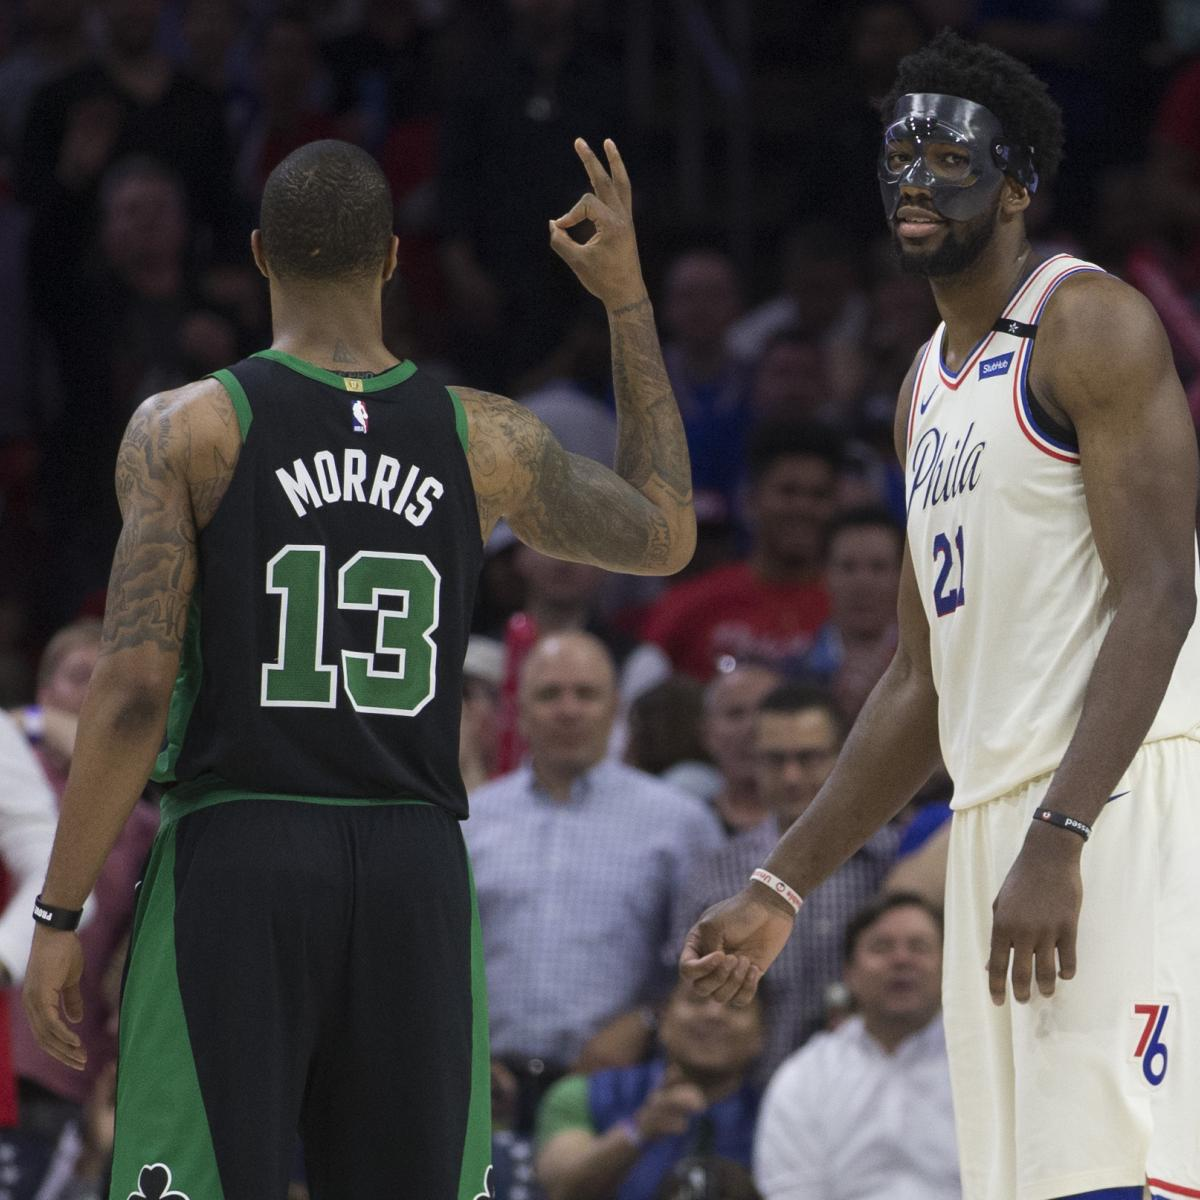 Rockets Vs Warriors Odds 2018: NBA Playoffs 2018: Wednesday's Game Times, TV, Live-Stream